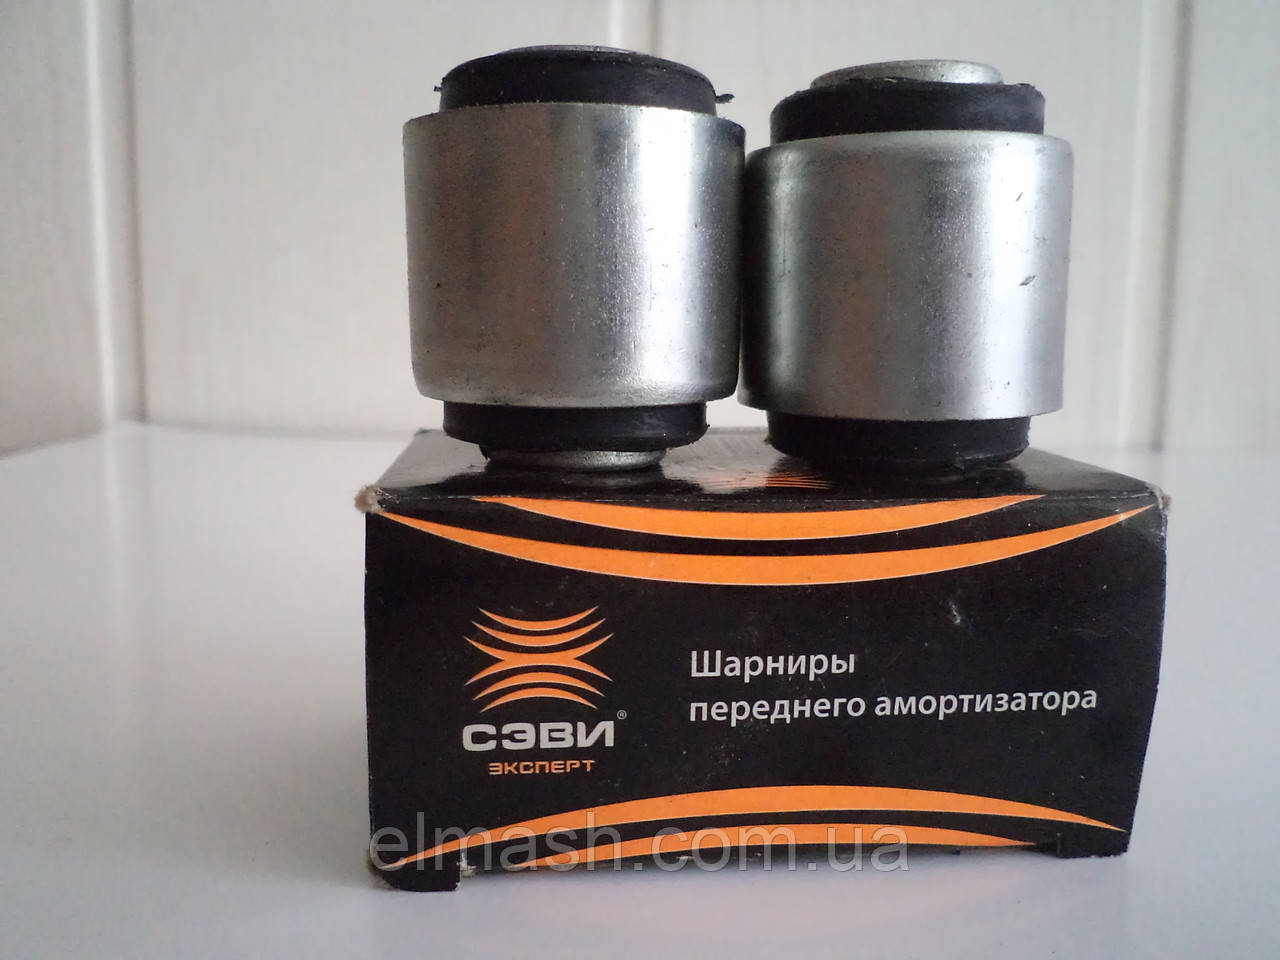 Шарнир амортизатора ВАЗ 2101-07 подвески передн. (компл. 2 шт.) <СЭВИ> (пр-во АТР-Холдинг)